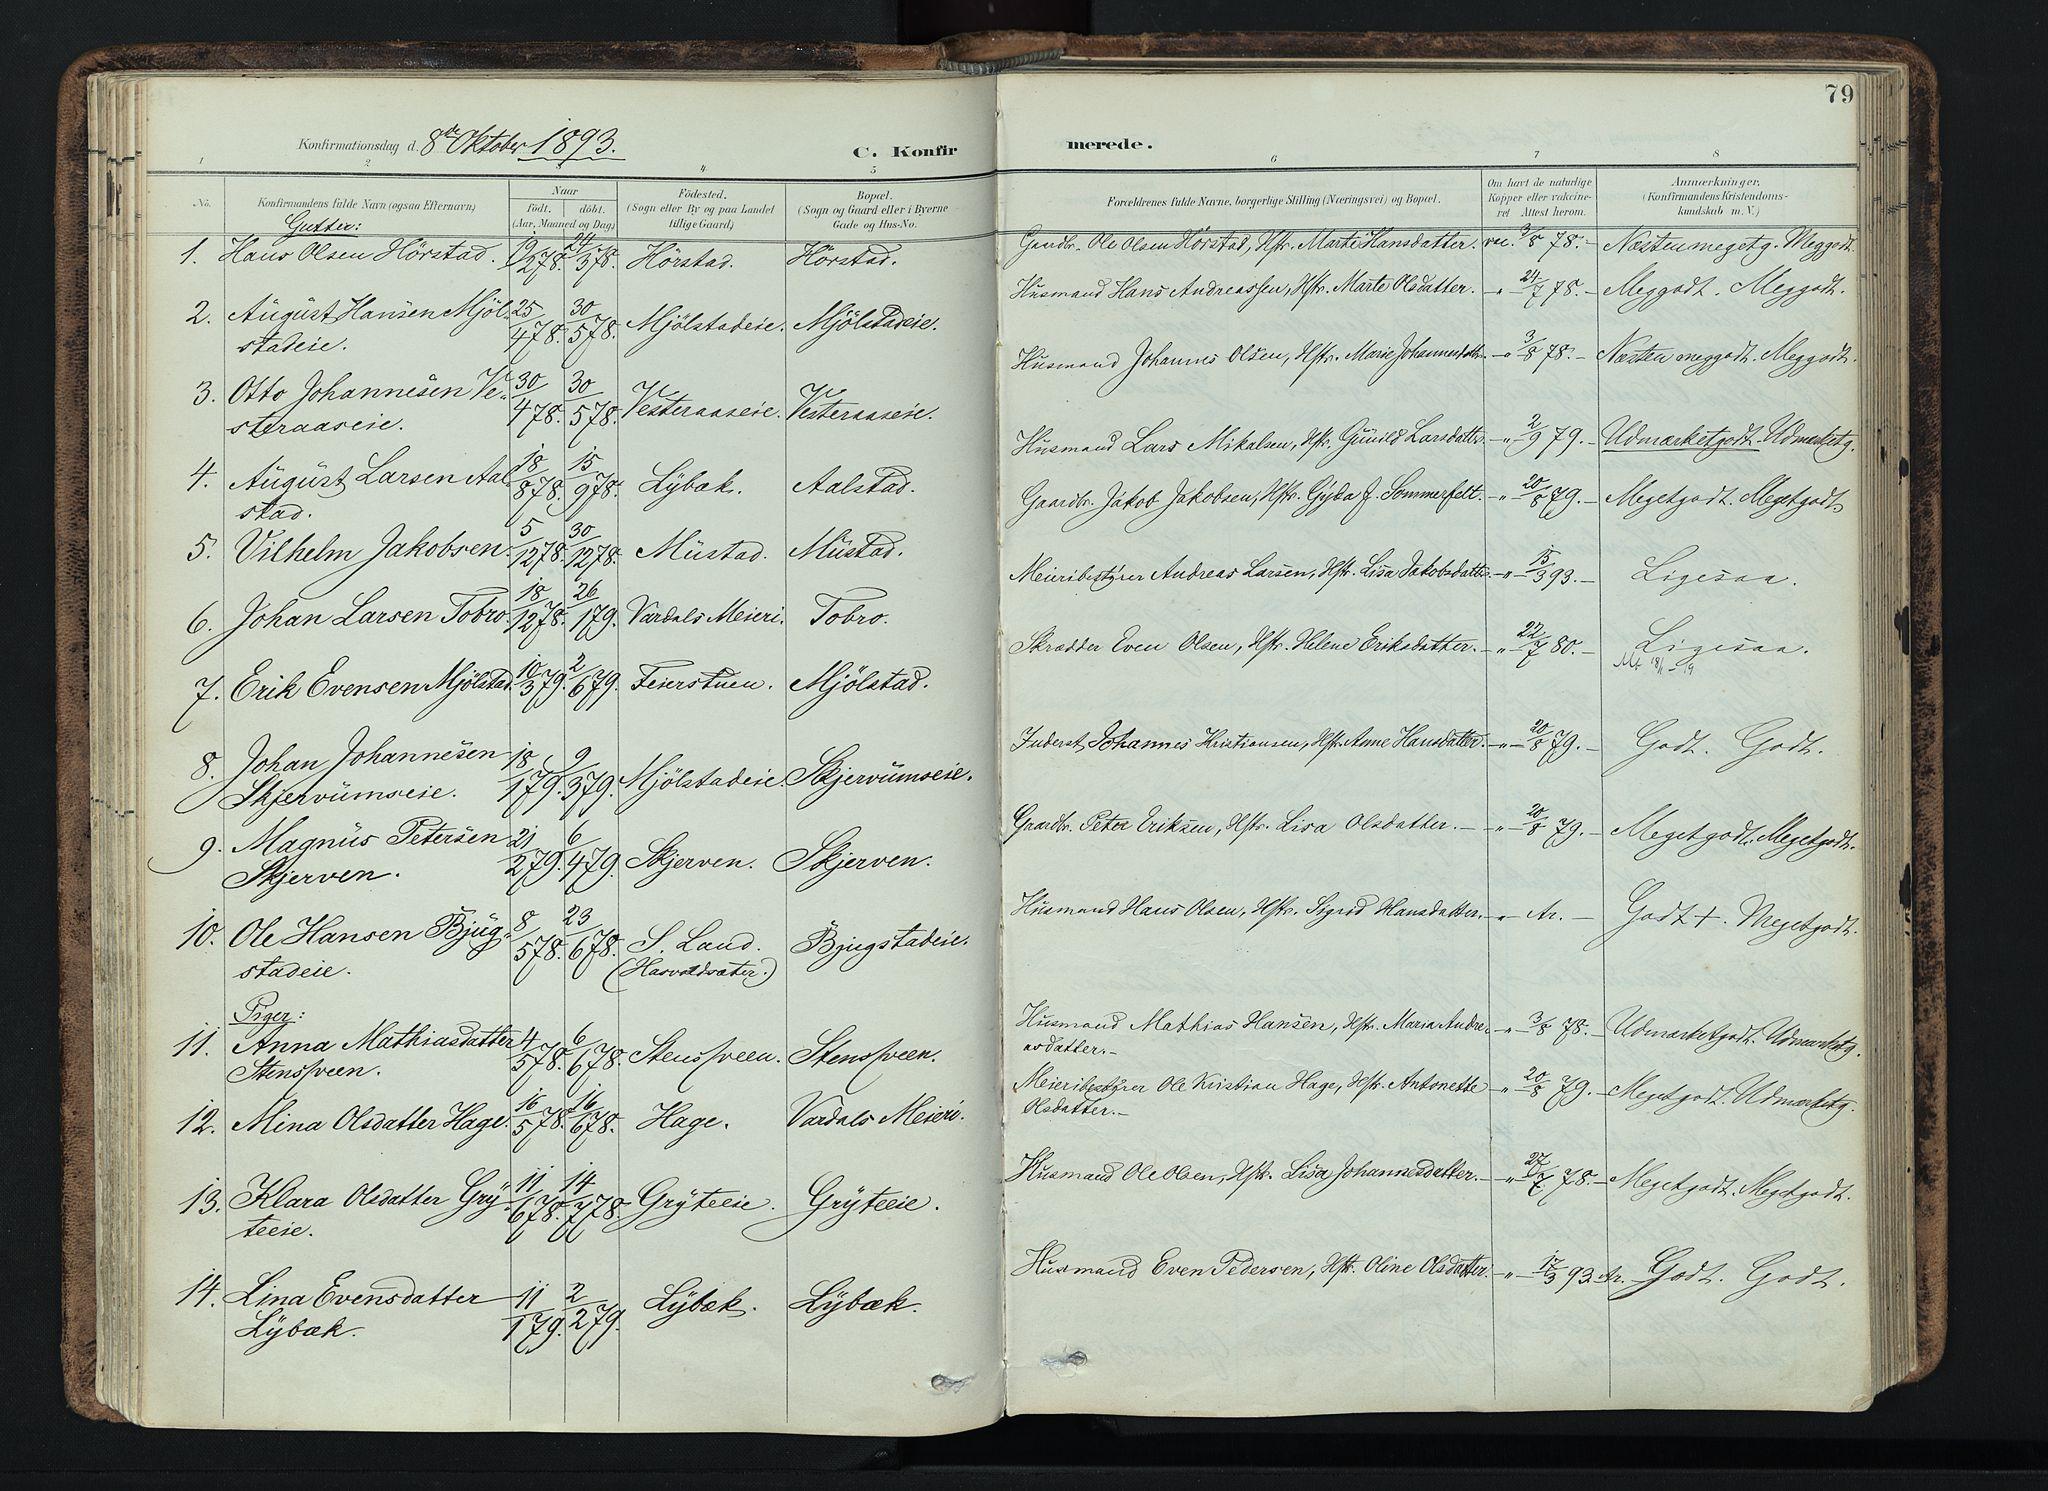 SAH, Vardal prestekontor, H/Ha/Haa/L0019: Ministerialbok nr. 19, 1893-1907, s. 79